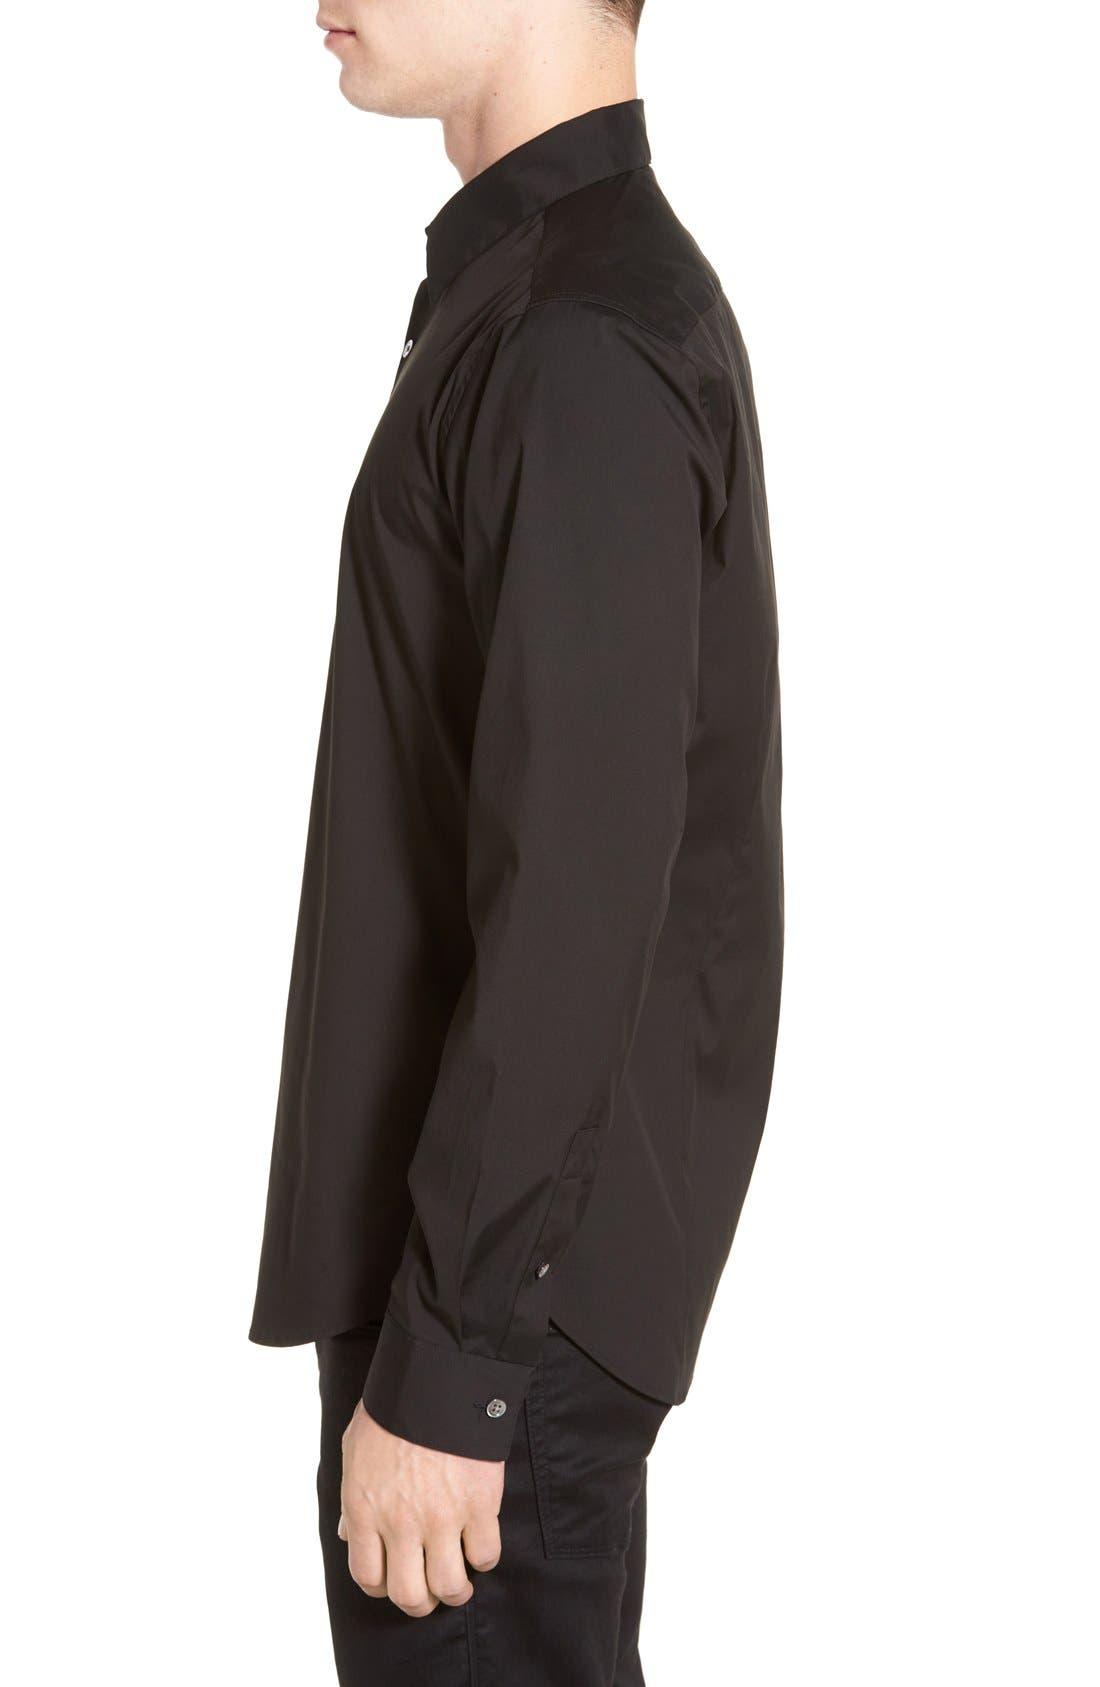 THEORY, 'Sylvain' Trim Fit Long Sleeve Sport Shirt, Alternate thumbnail 2, color, BLACK